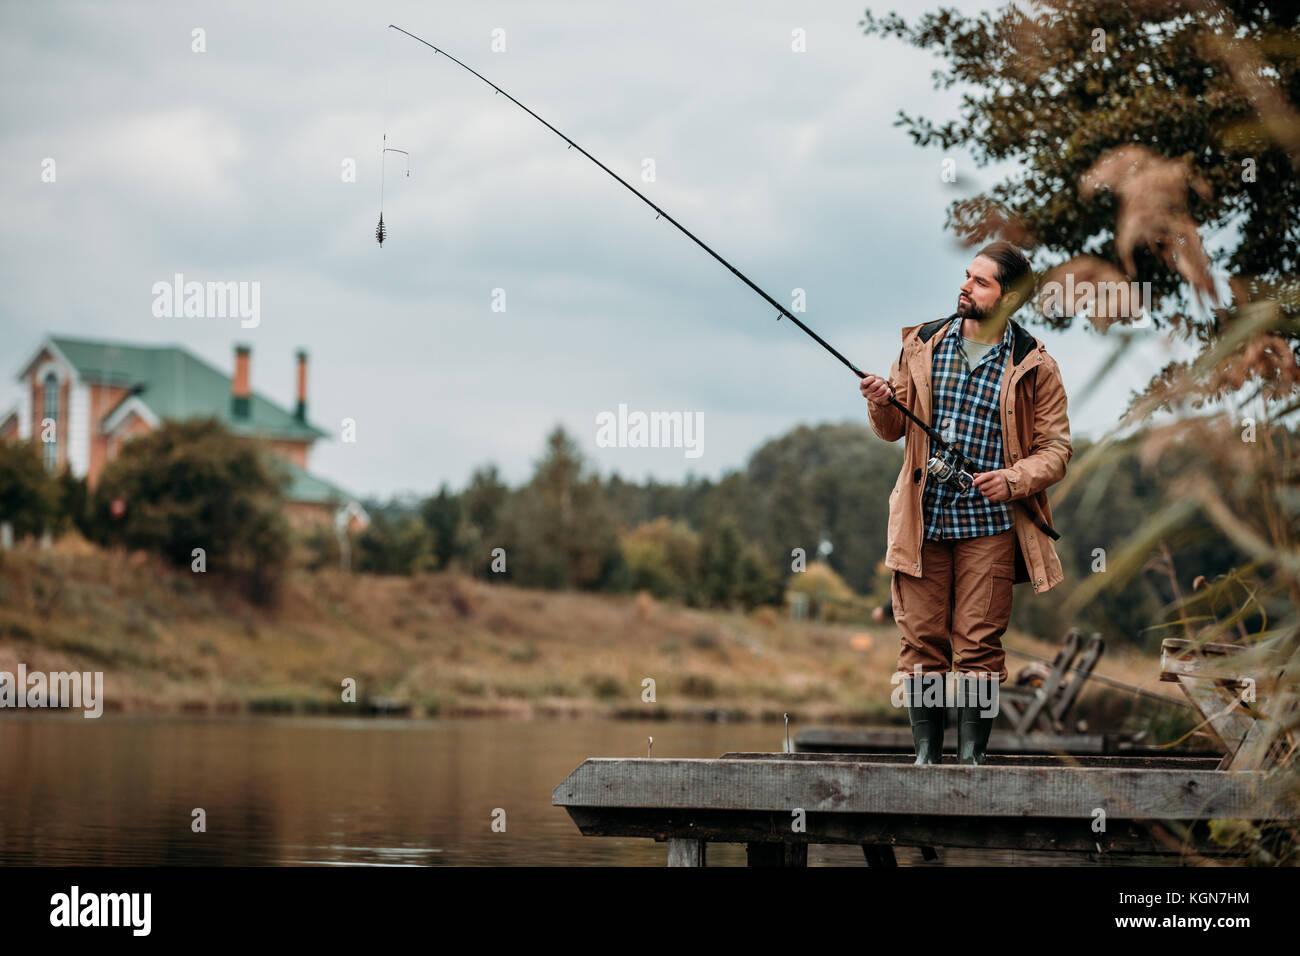 Mann Angeln mit Rute am See Stockbild